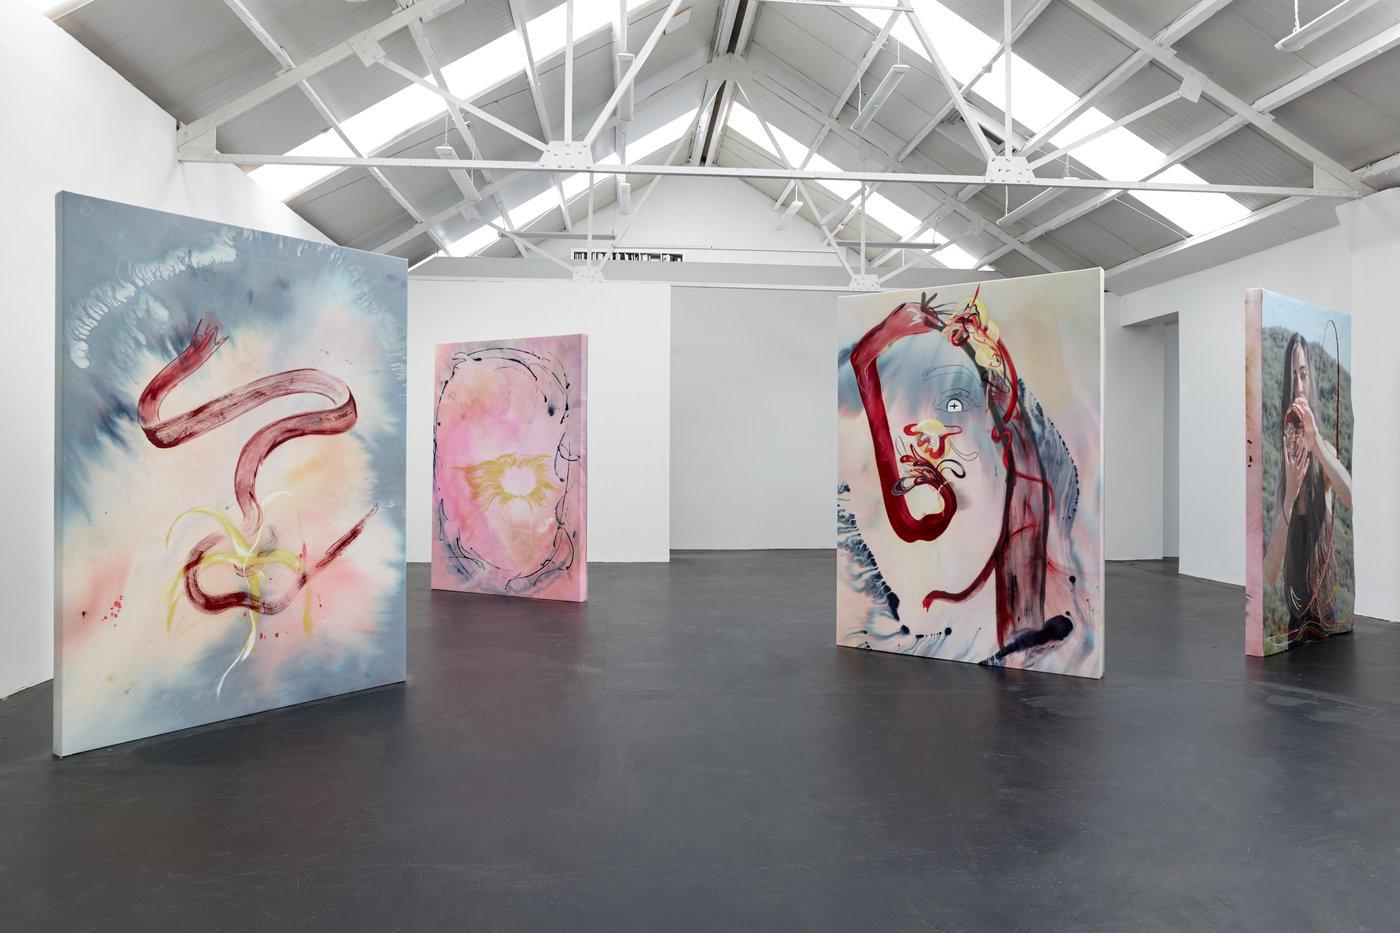 06. Nora Berman - Charm - Installation View VI